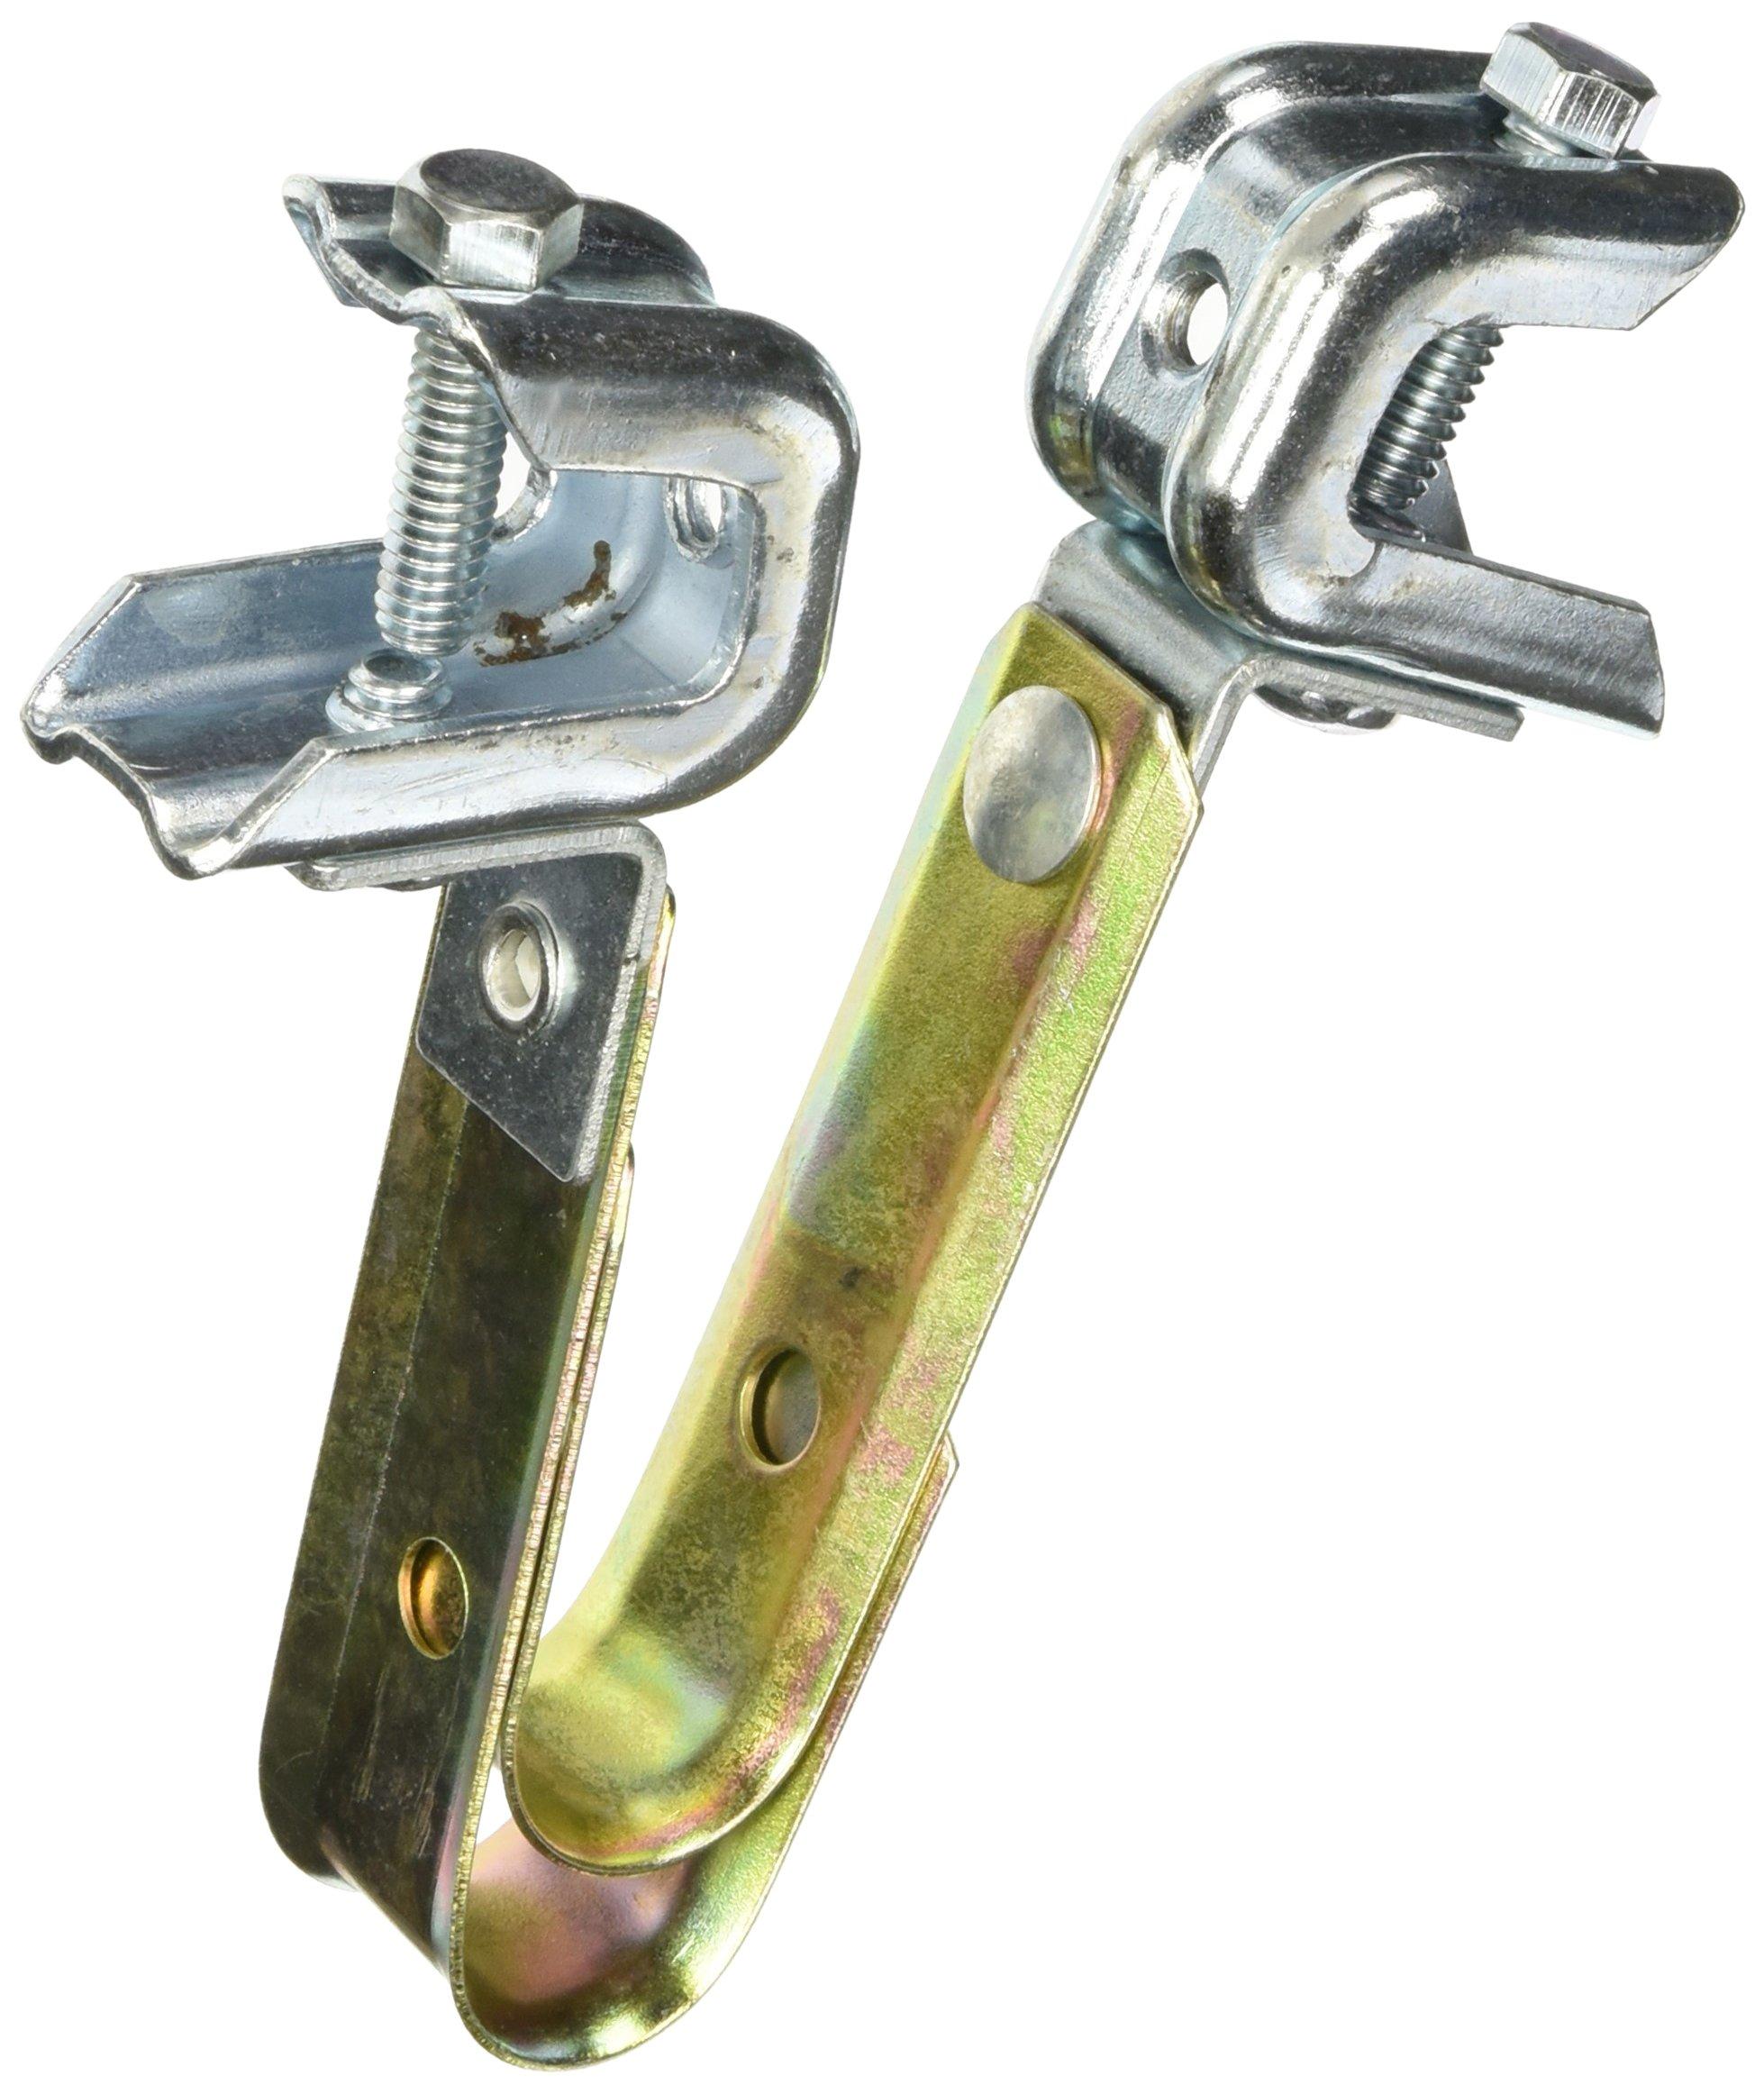 Platinum Tools JH12BC-100 3/4-Inch Beam Clamp J-Hook, Size 12, 100 Per Box by Platinum Tools